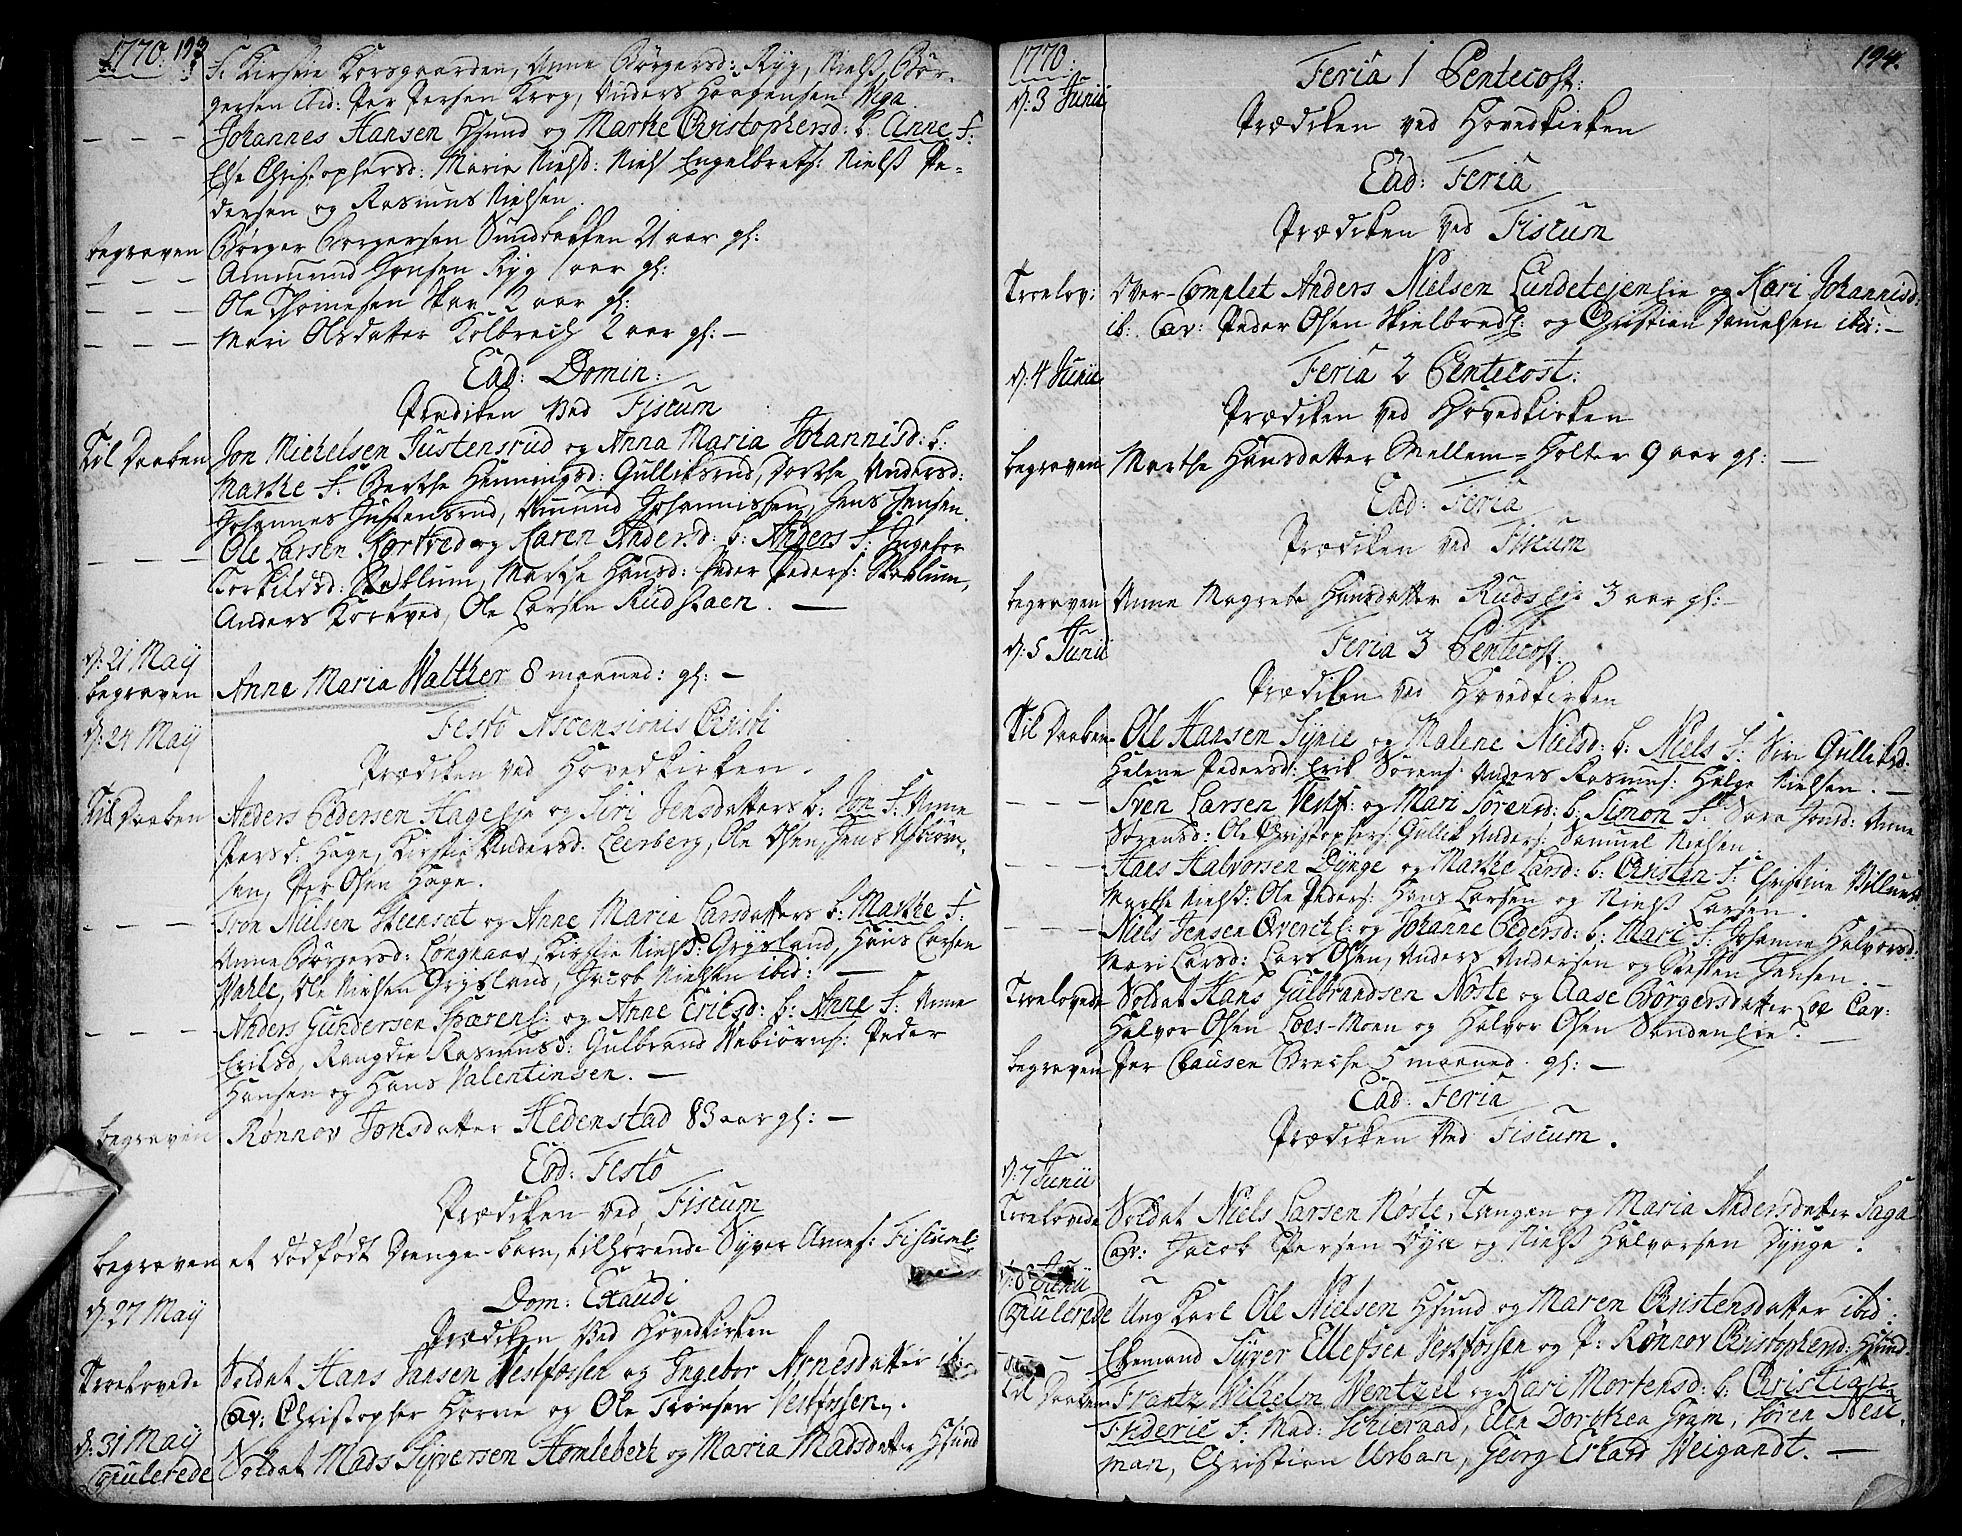 SAKO, Eiker kirkebøker, F/Fa/L0008: Ministerialbok nr. I 8, 1764-1788, s. 193-194